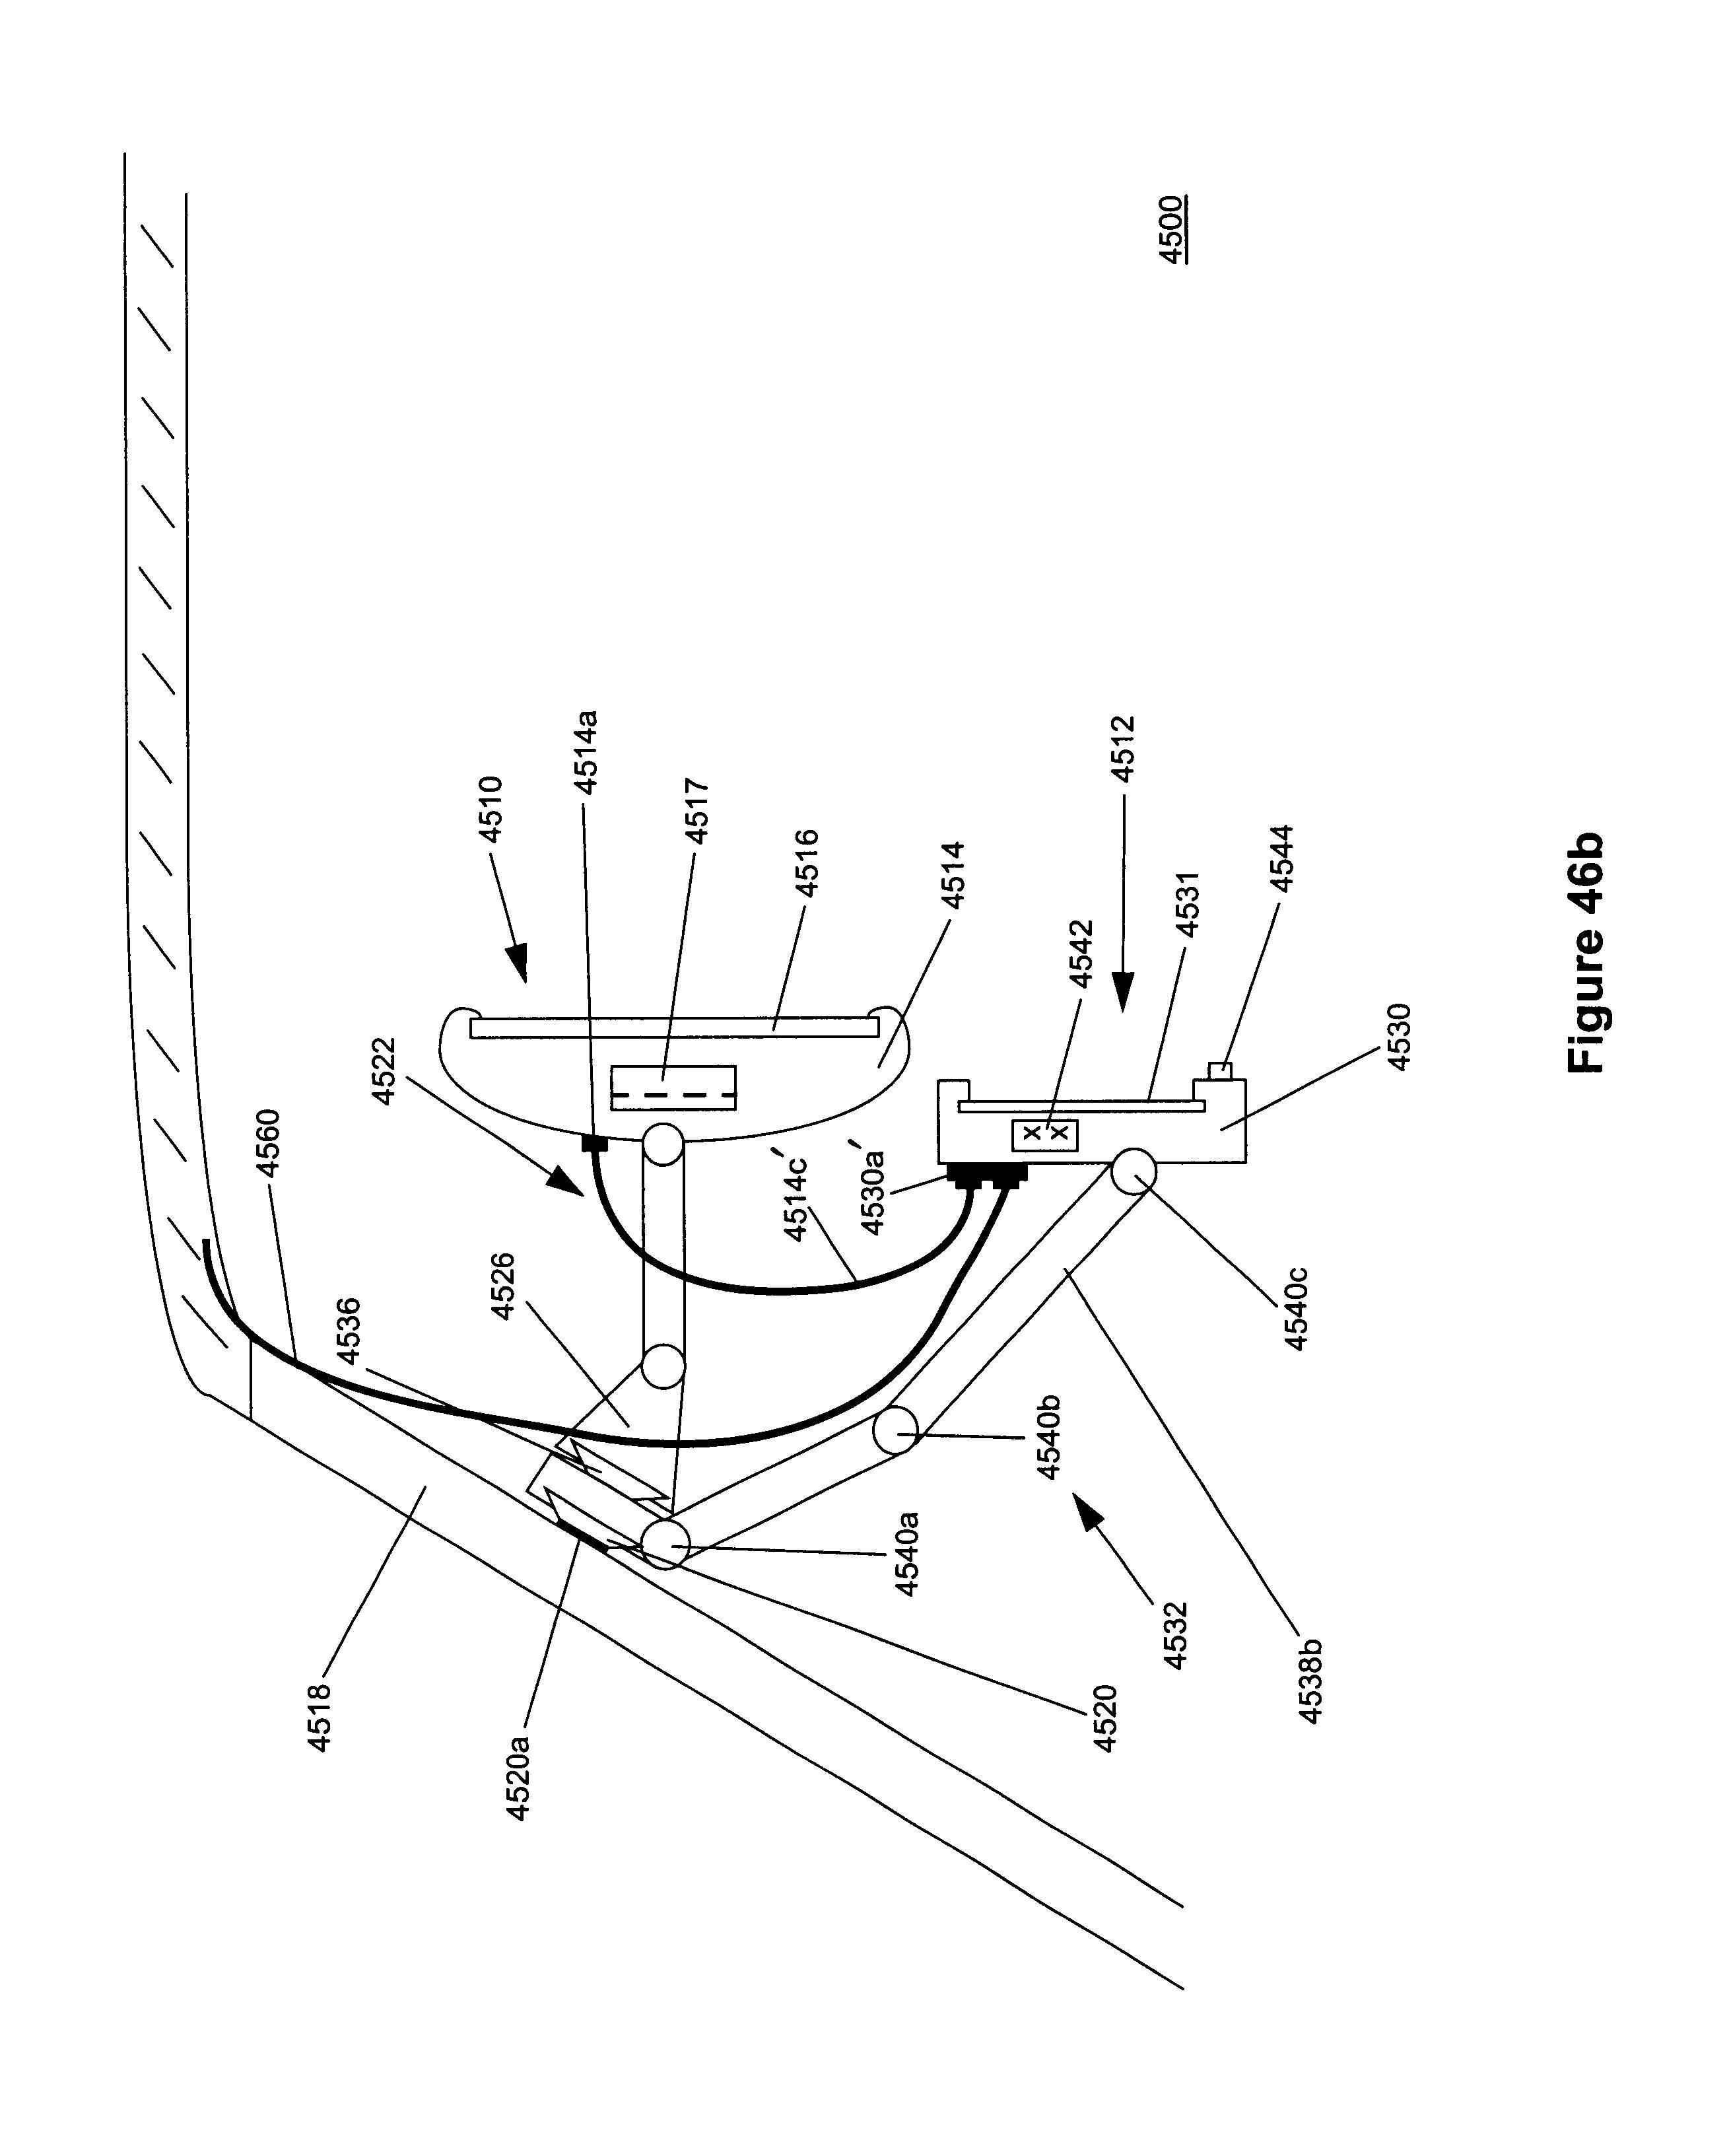 Patent Us 6690268 B2 Honda 4514 Wiring Diagram Schematic Images